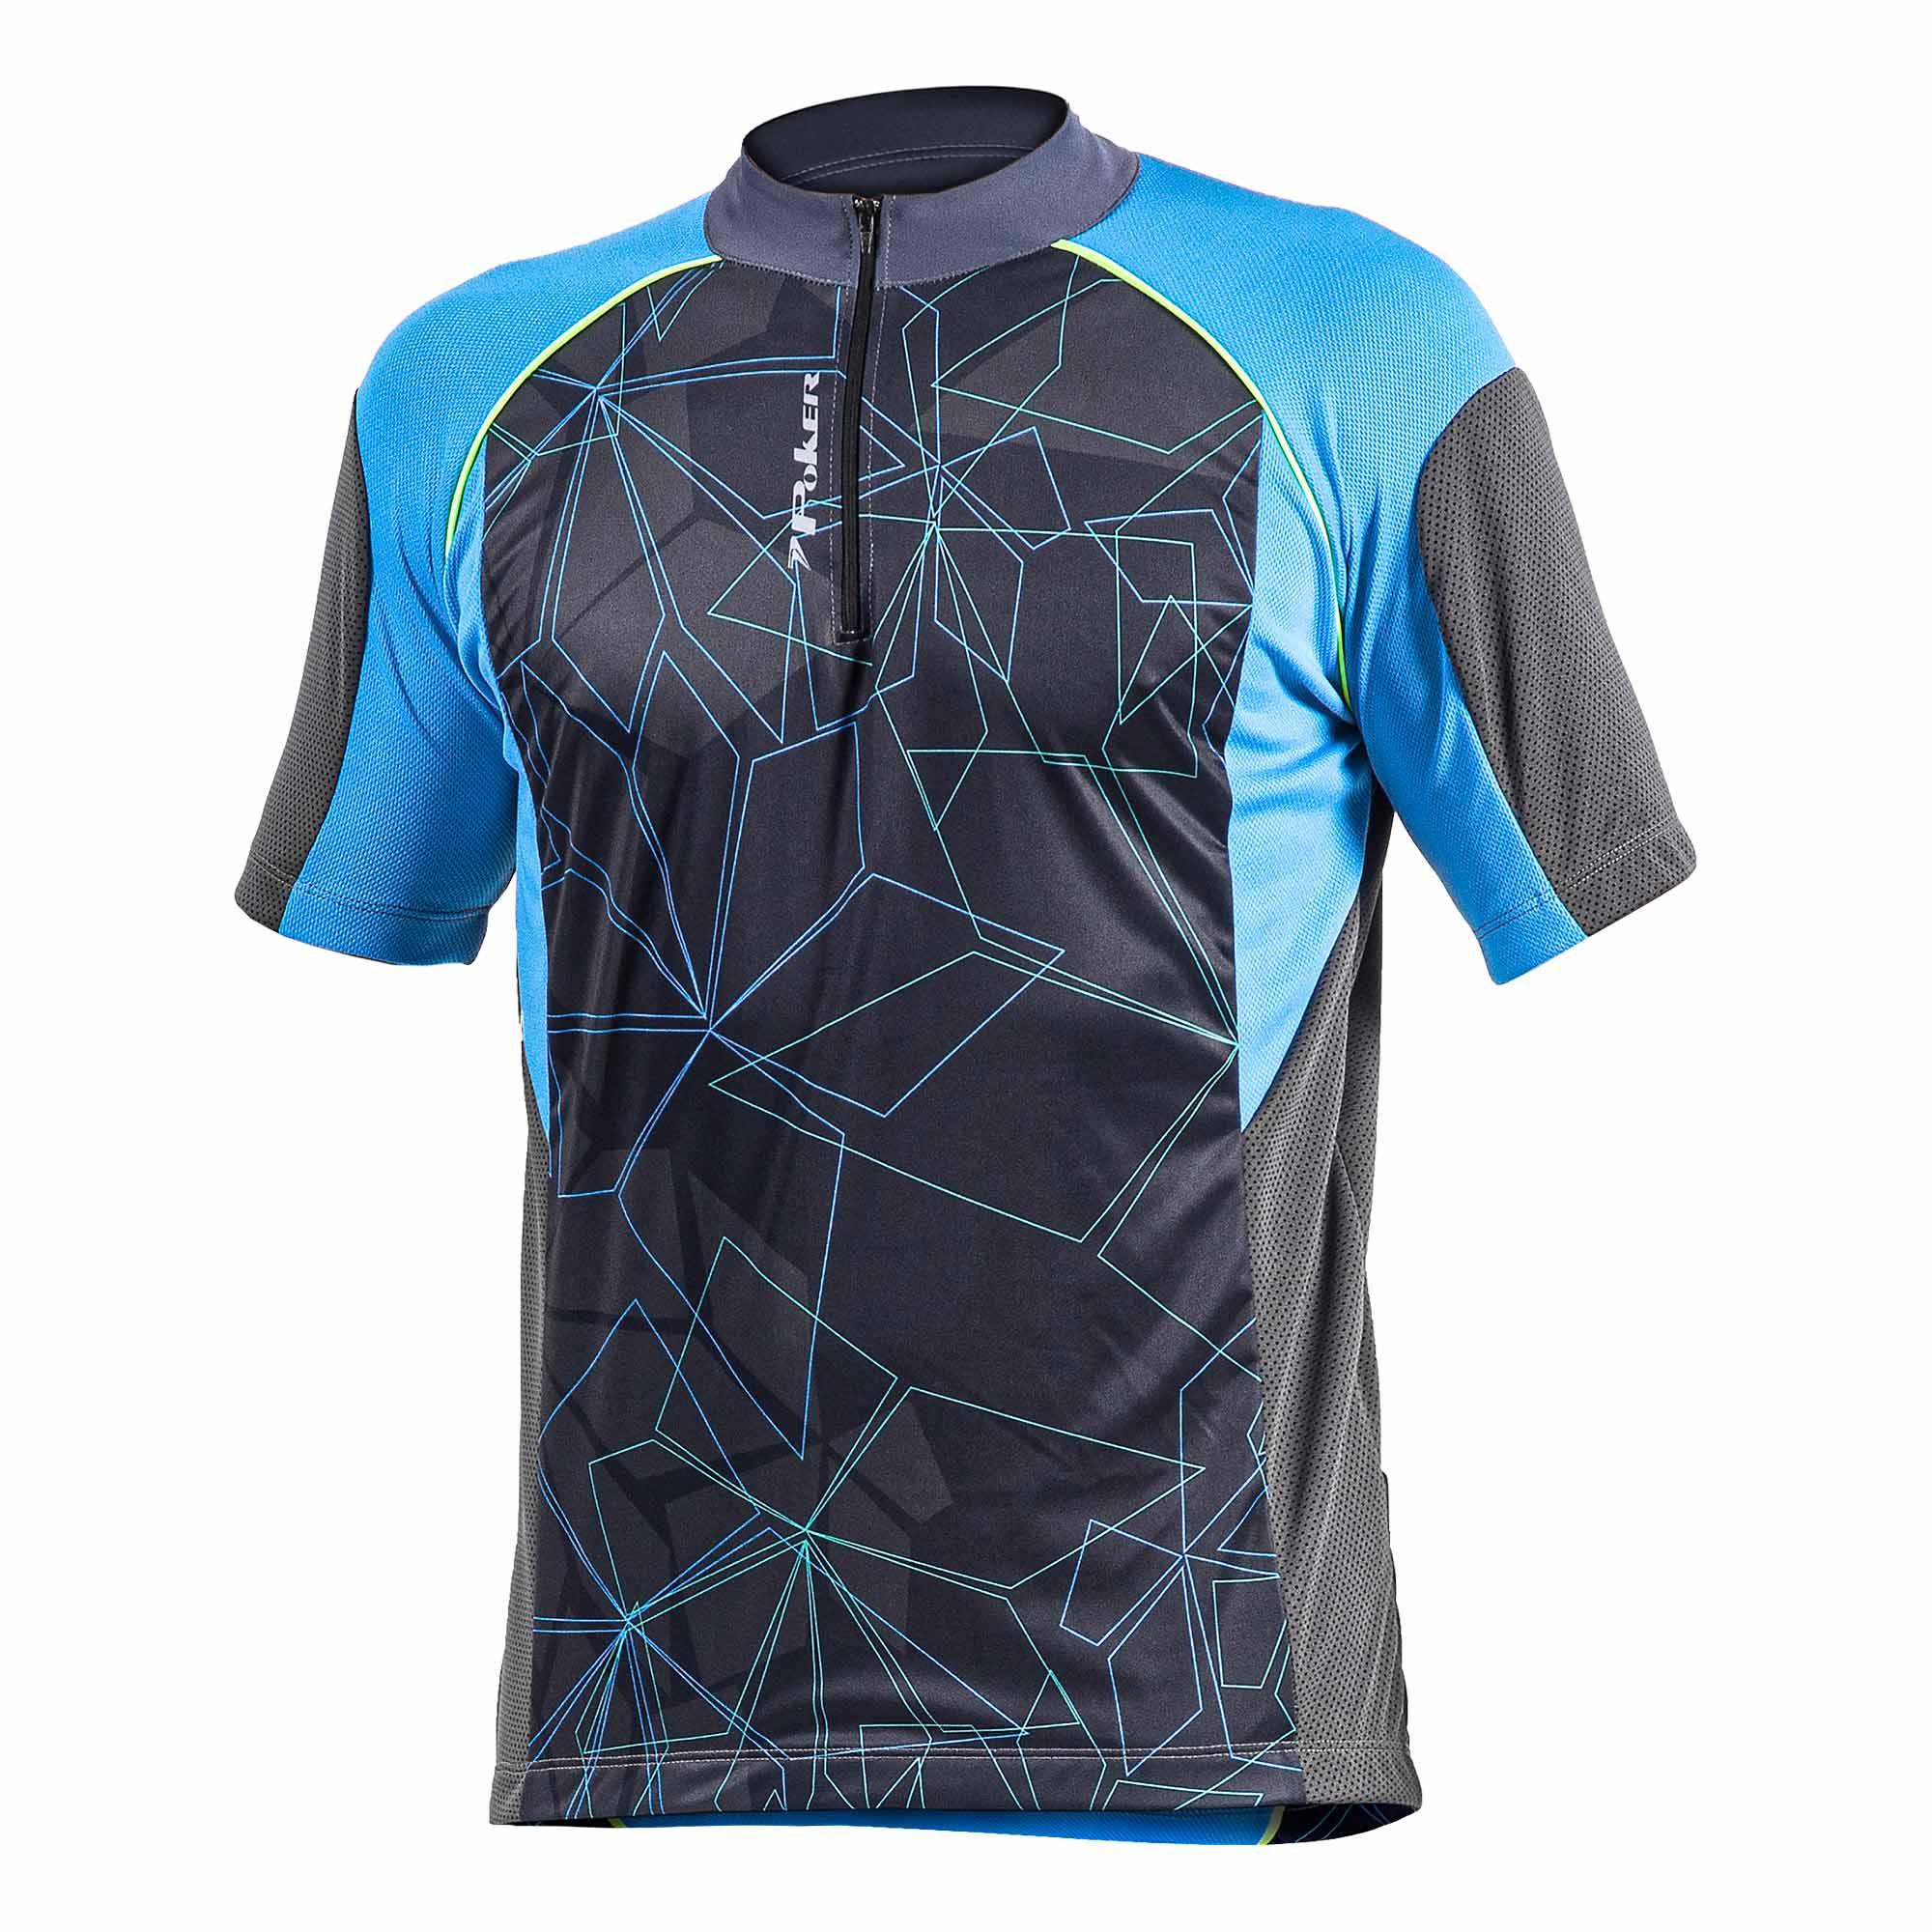 Camisa Ciclismo Dare Cinza/Azul - Poker